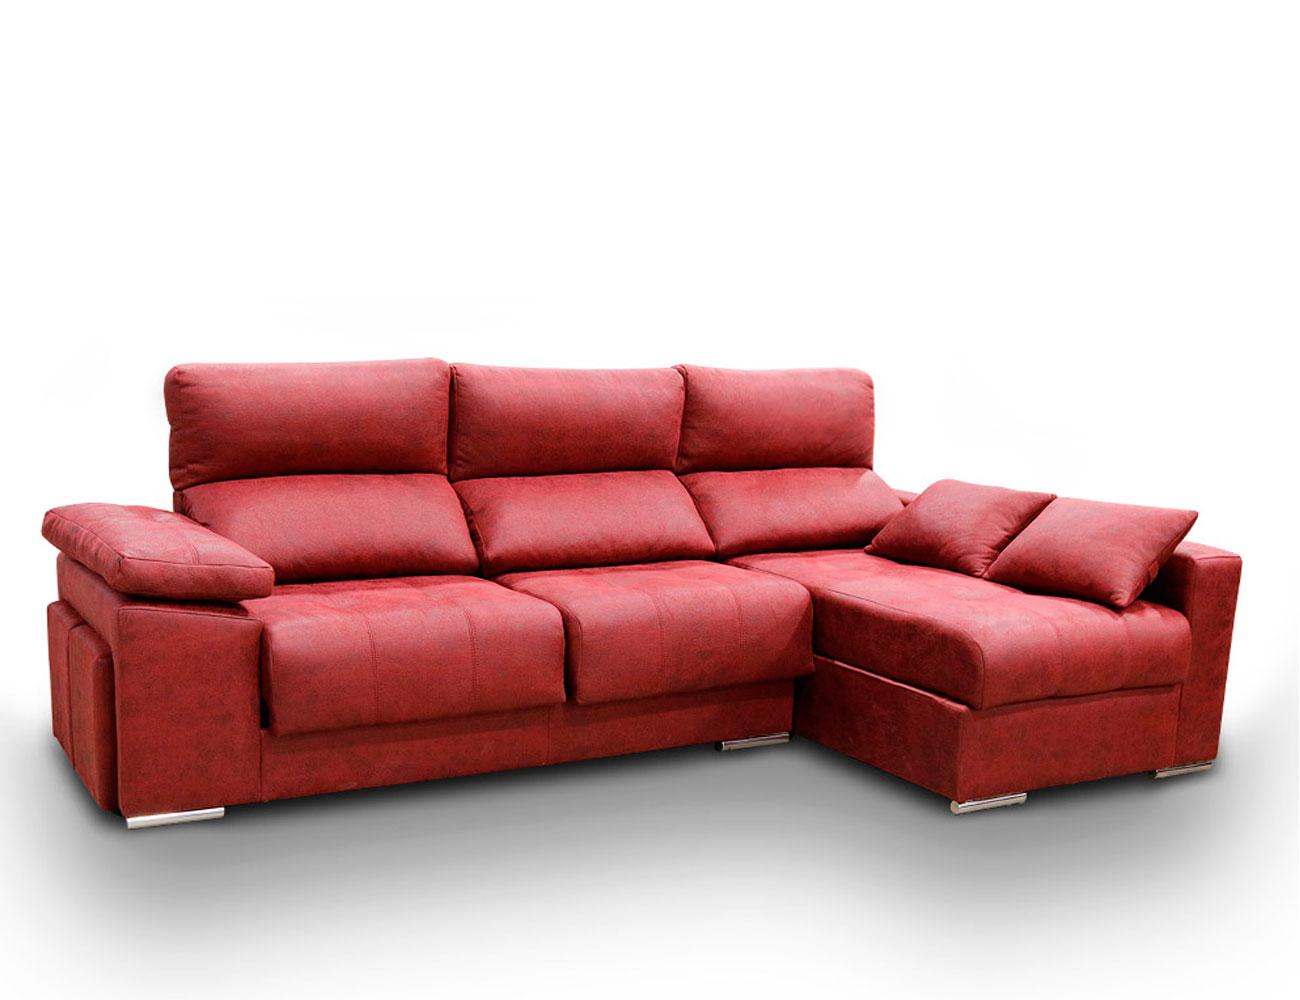 Sofa chaiselongue anti manchas rojo granate4